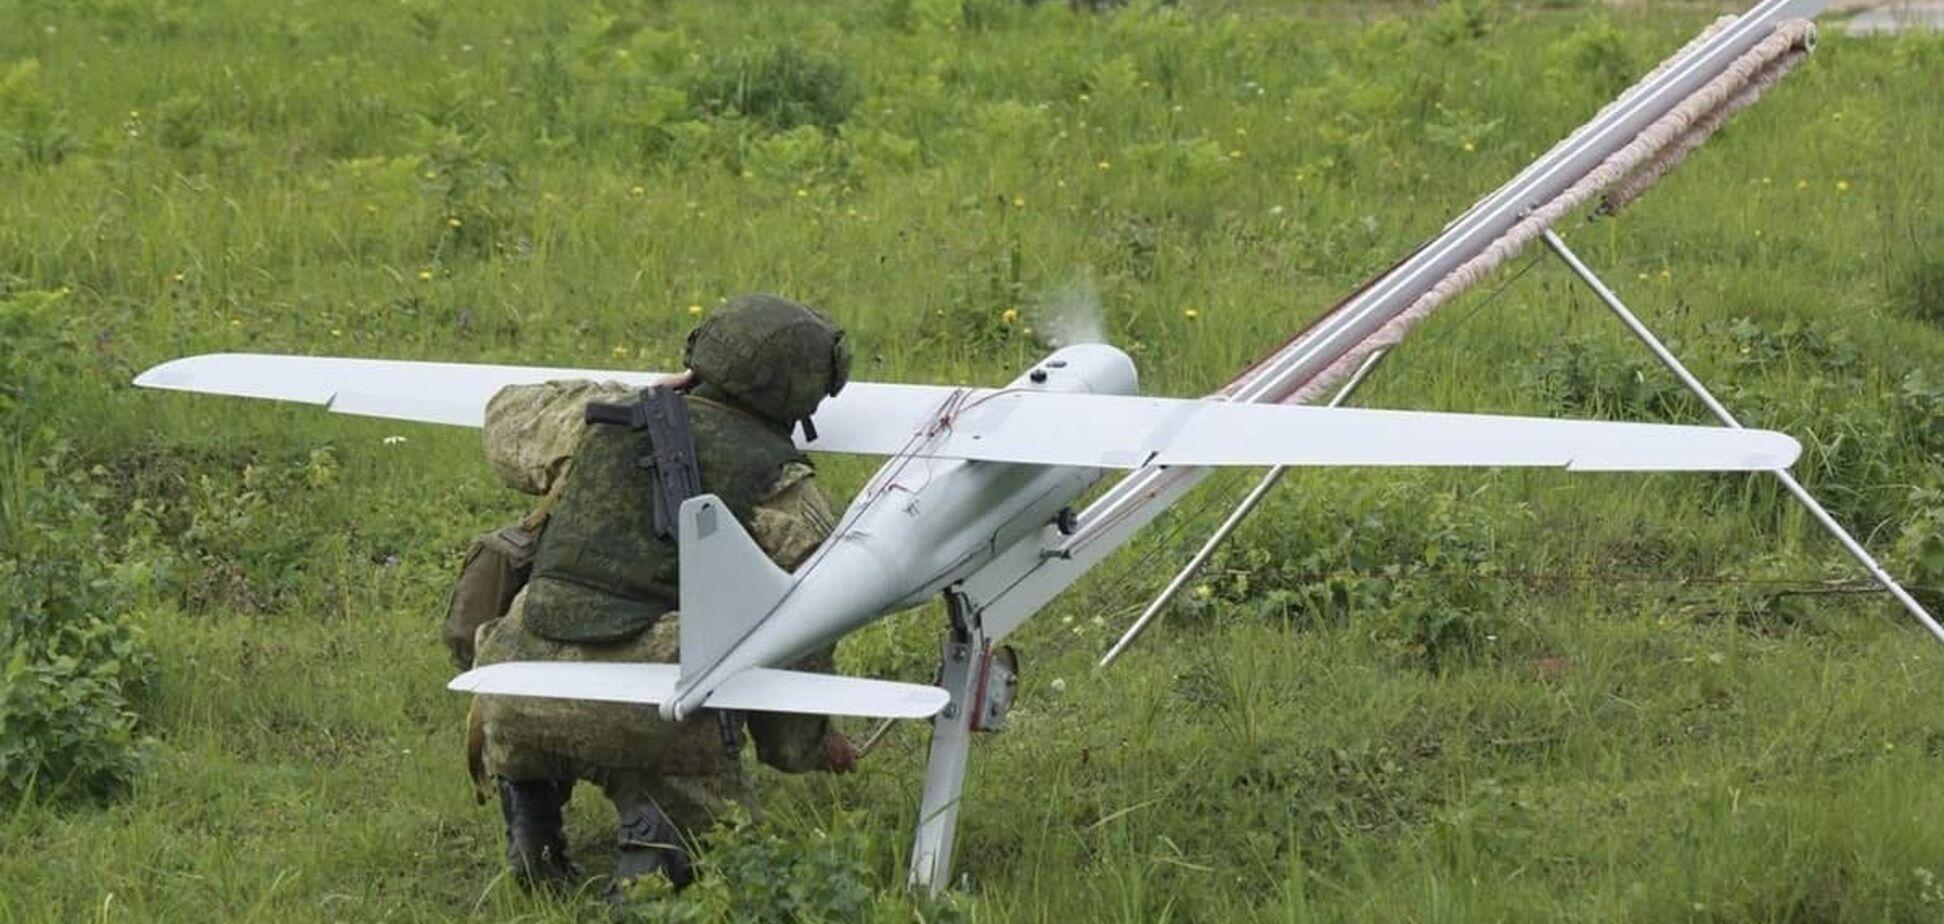 Терористи скинули ВОГ-17 на ОС з БПЛА